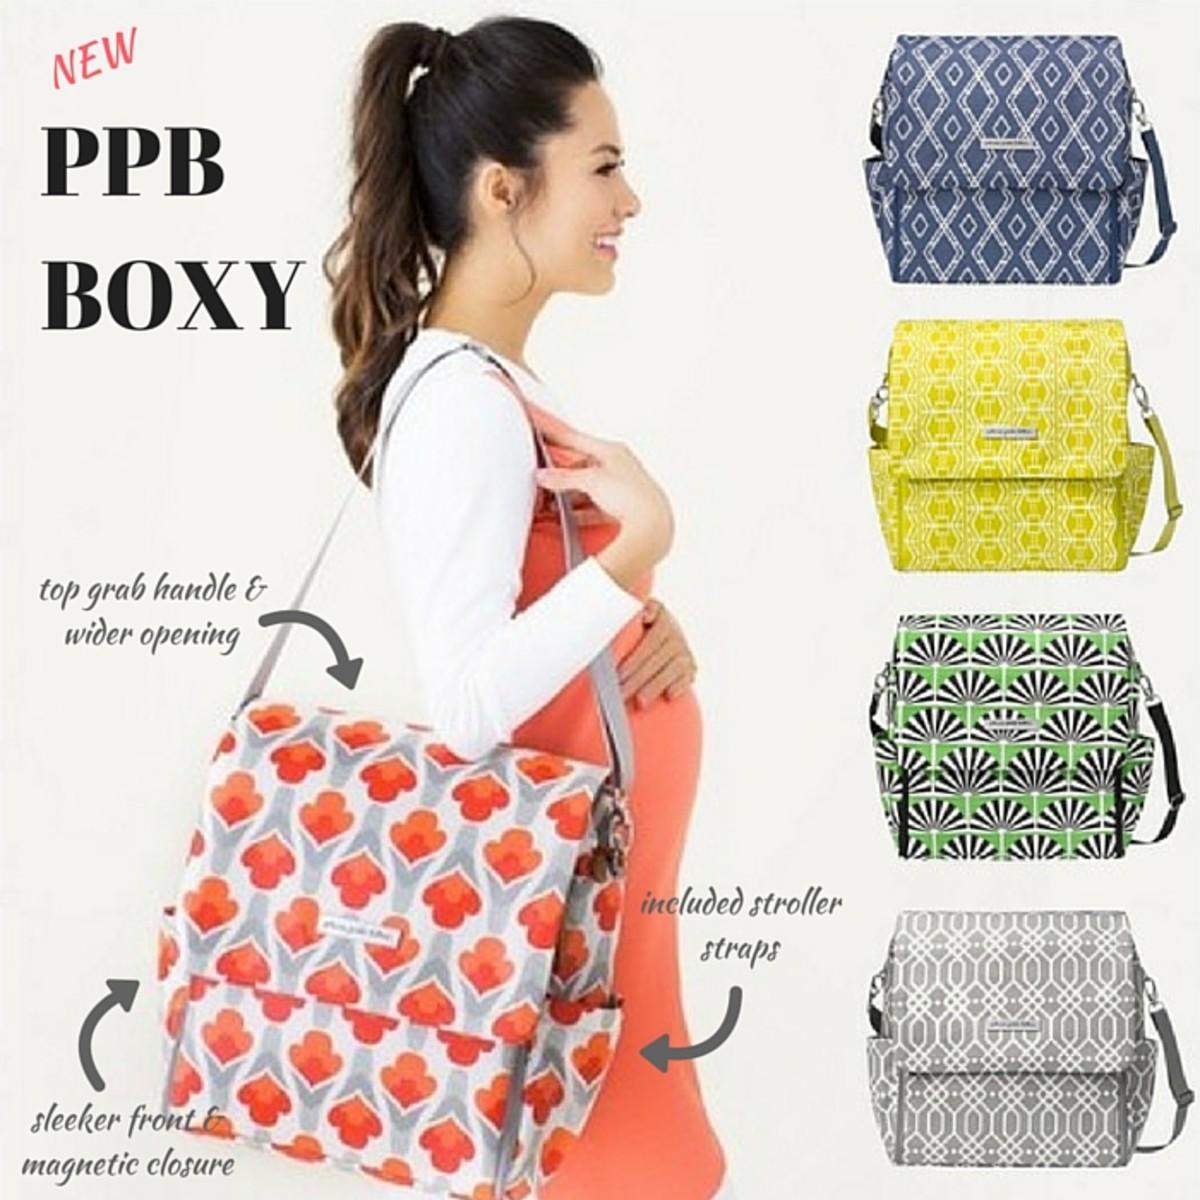 New Petunia Pickle Bottom Boxy Backpack